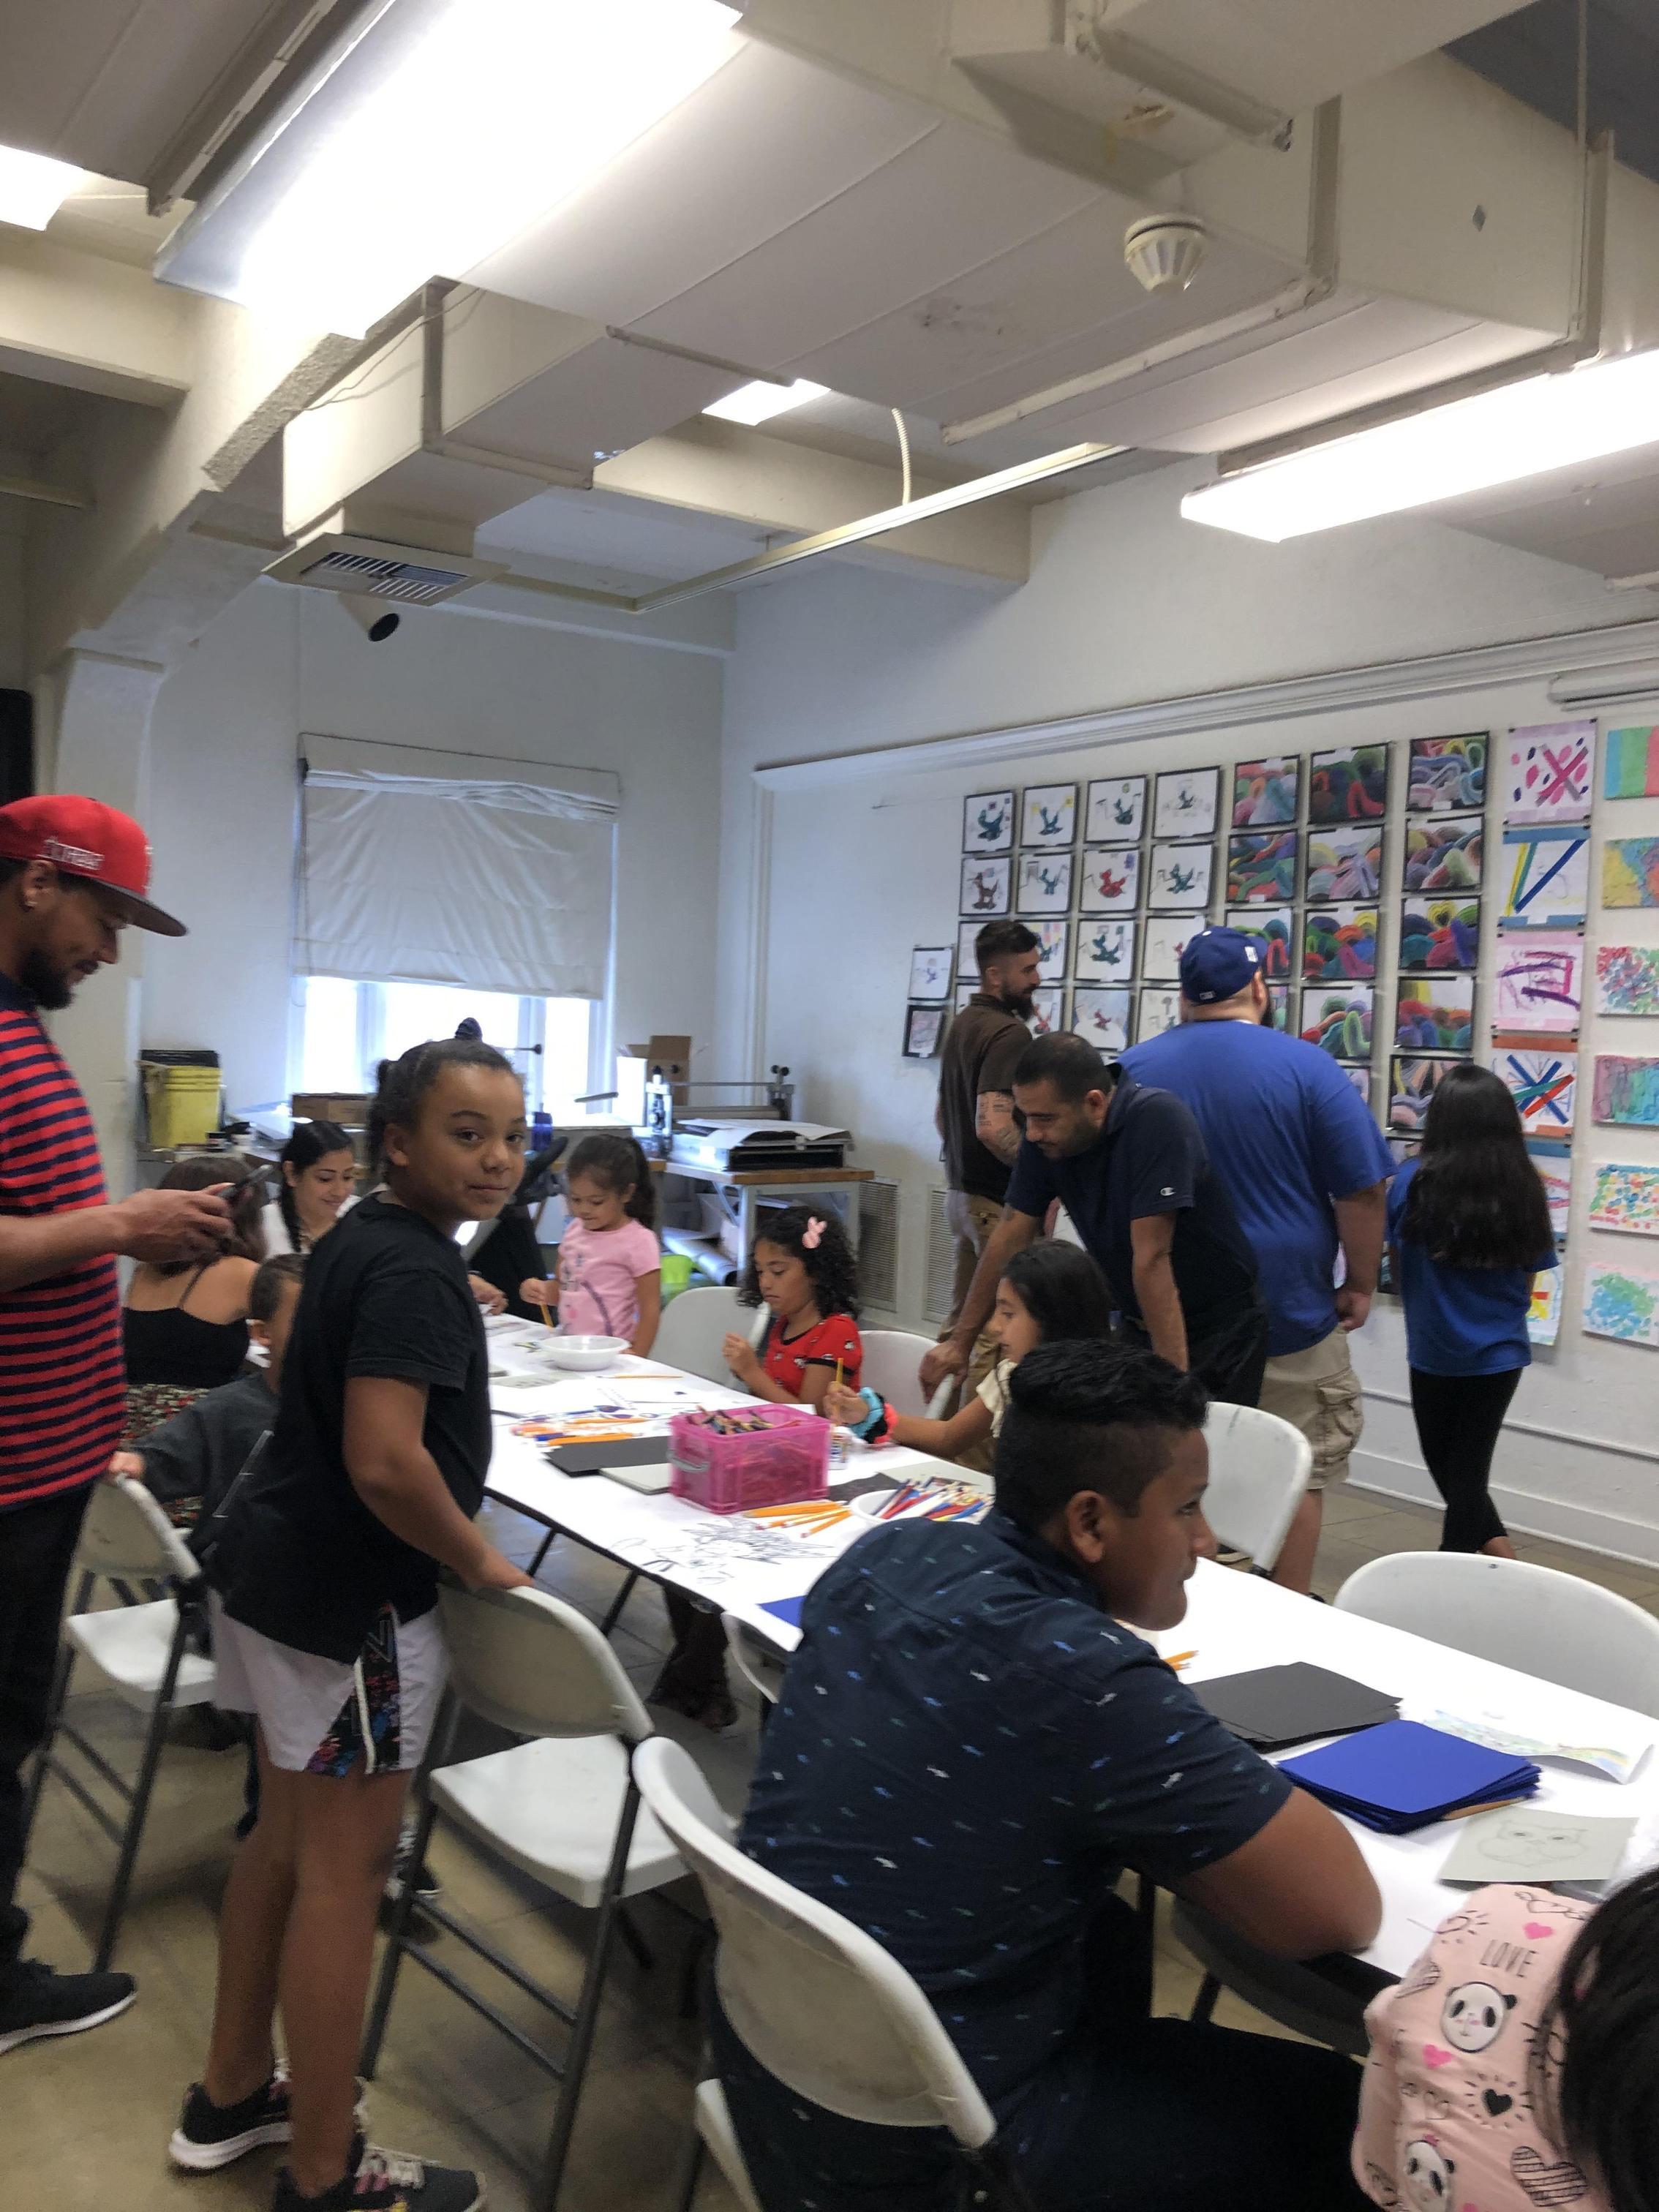 Students doing art activity